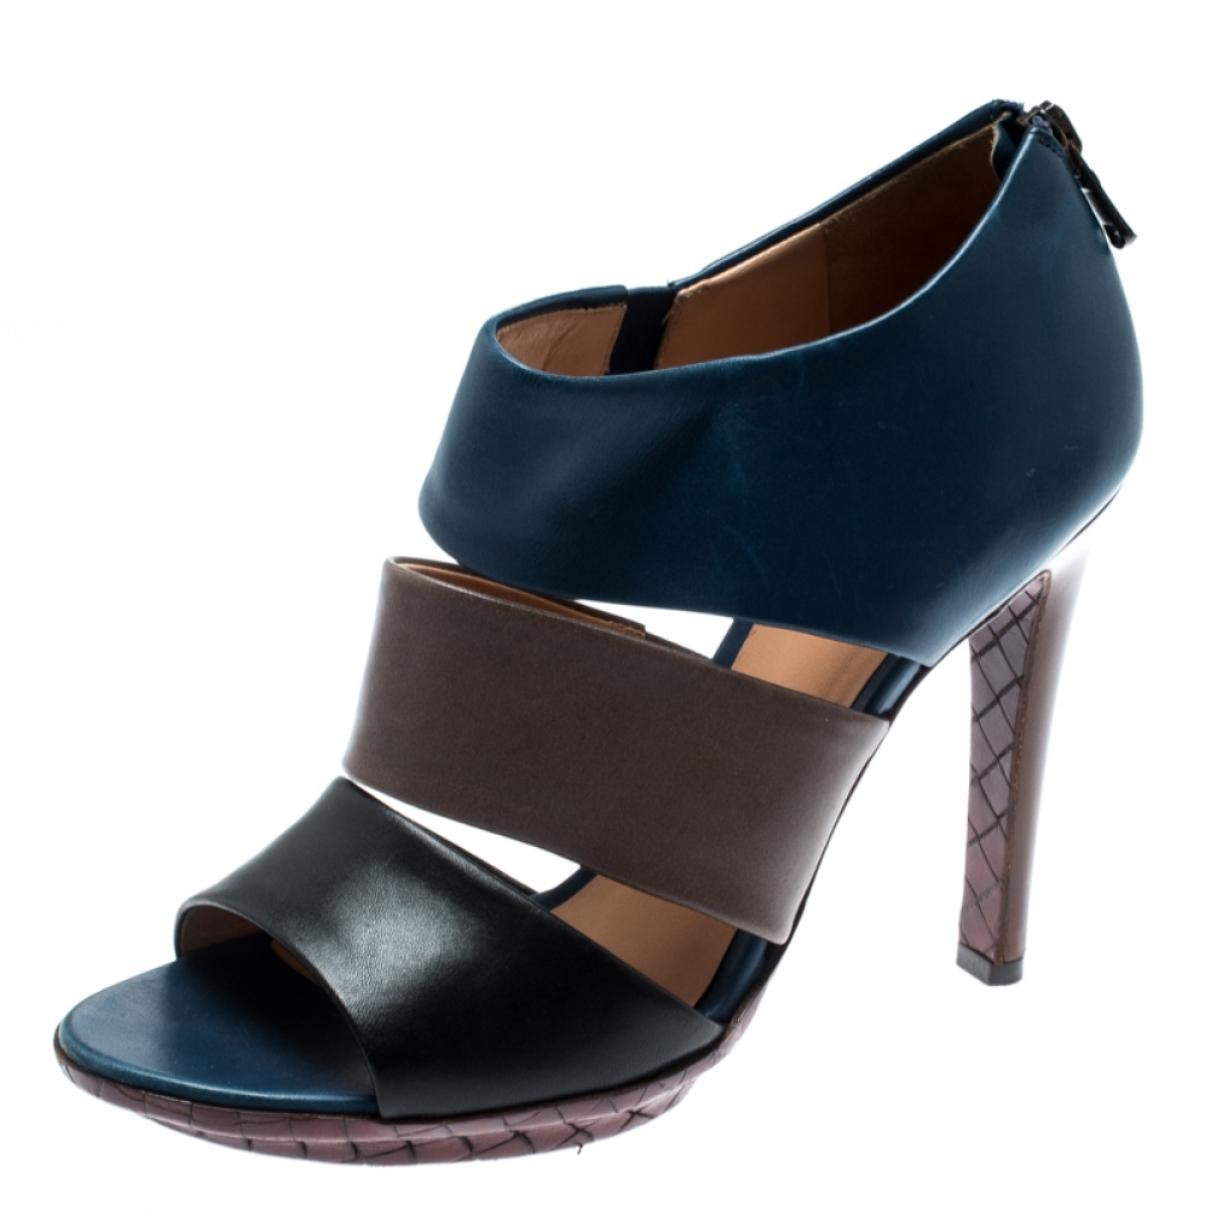 Bottega Veneta \N Multicolour Leather Sandals for Women 36.5 EU